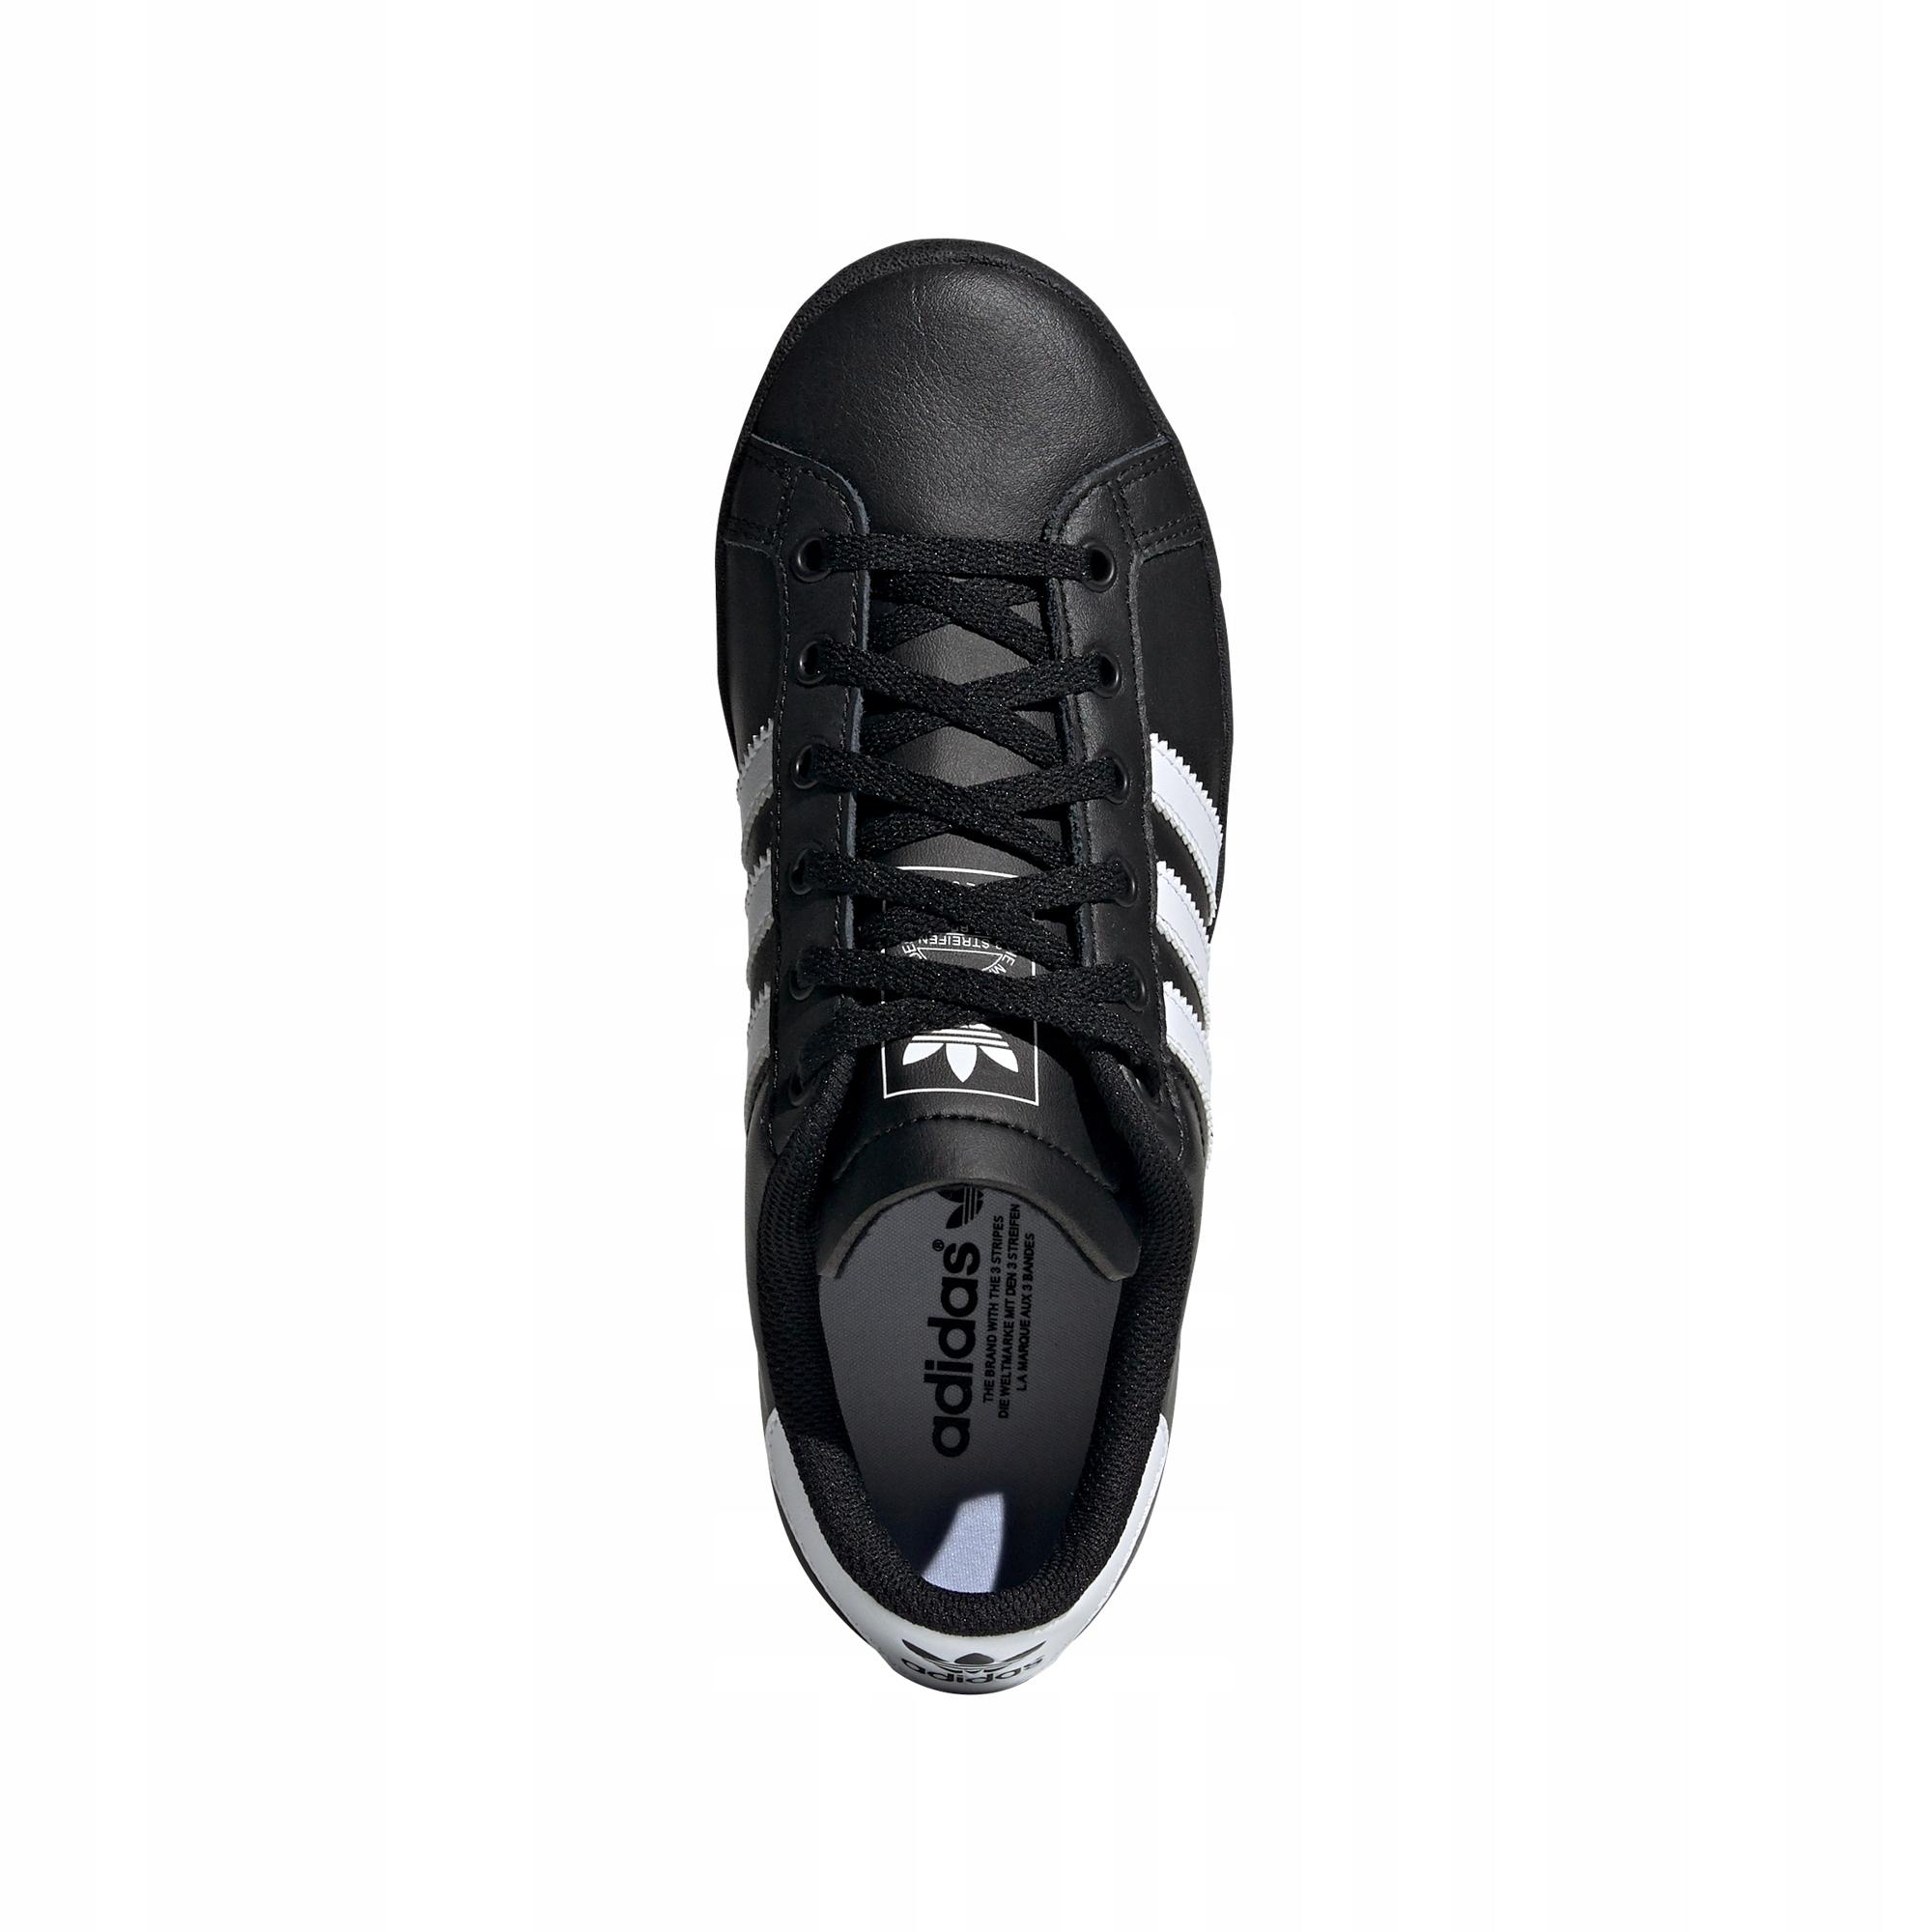 buty adidas Coast Star J r 38 EE9699